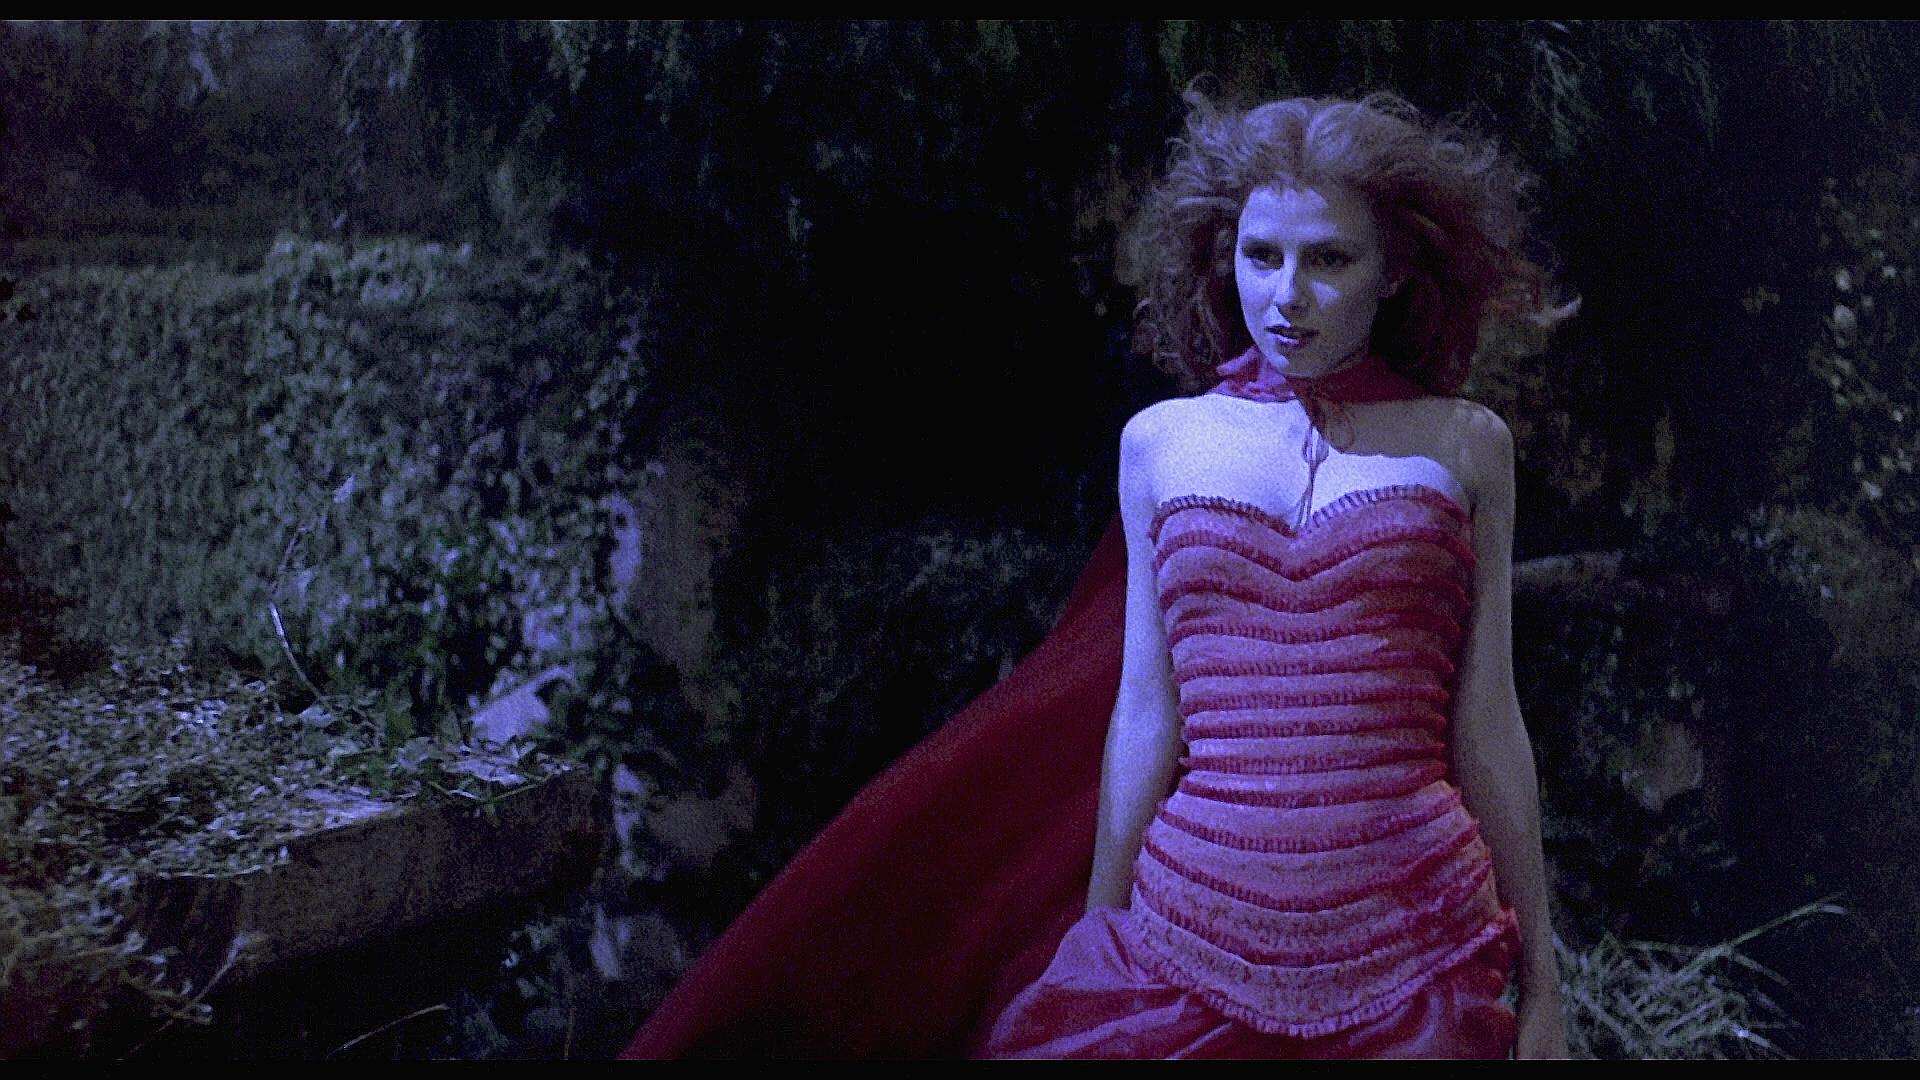 Bram Stokers Dracula 1992 Blu Ray Screen Capture